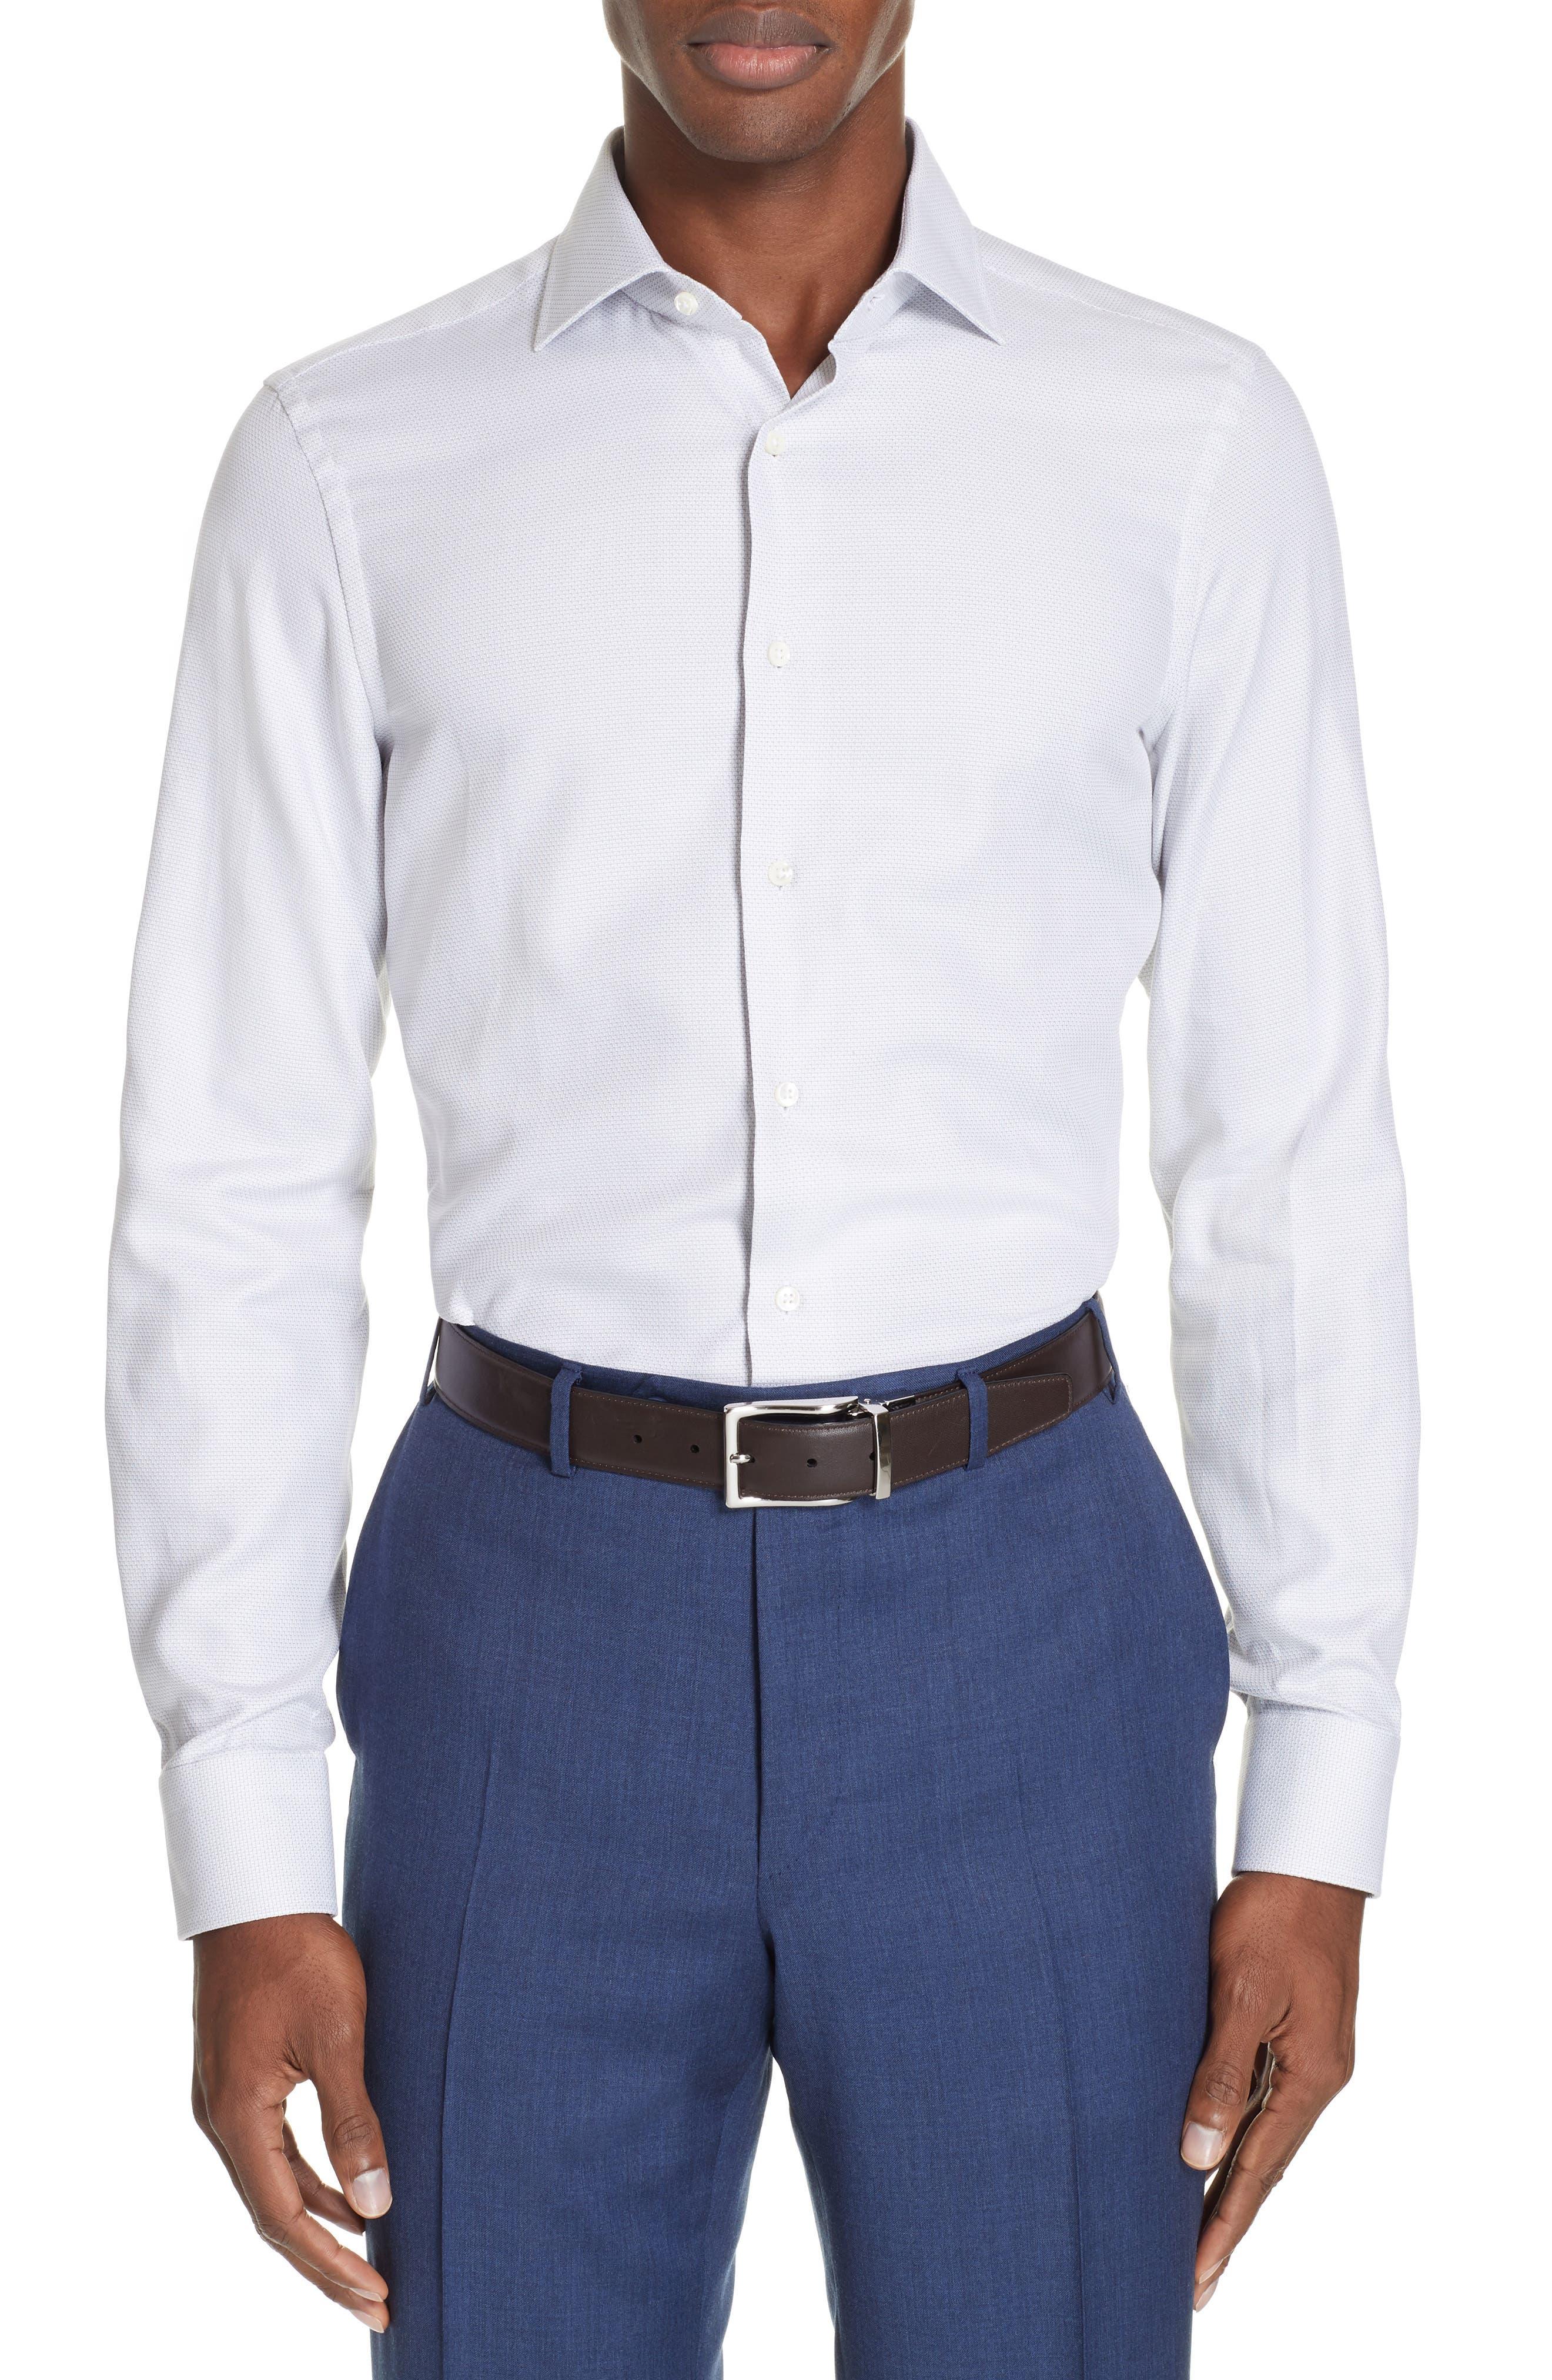 Regular Fit Solid Dress Shirt, Main, color, SILVER